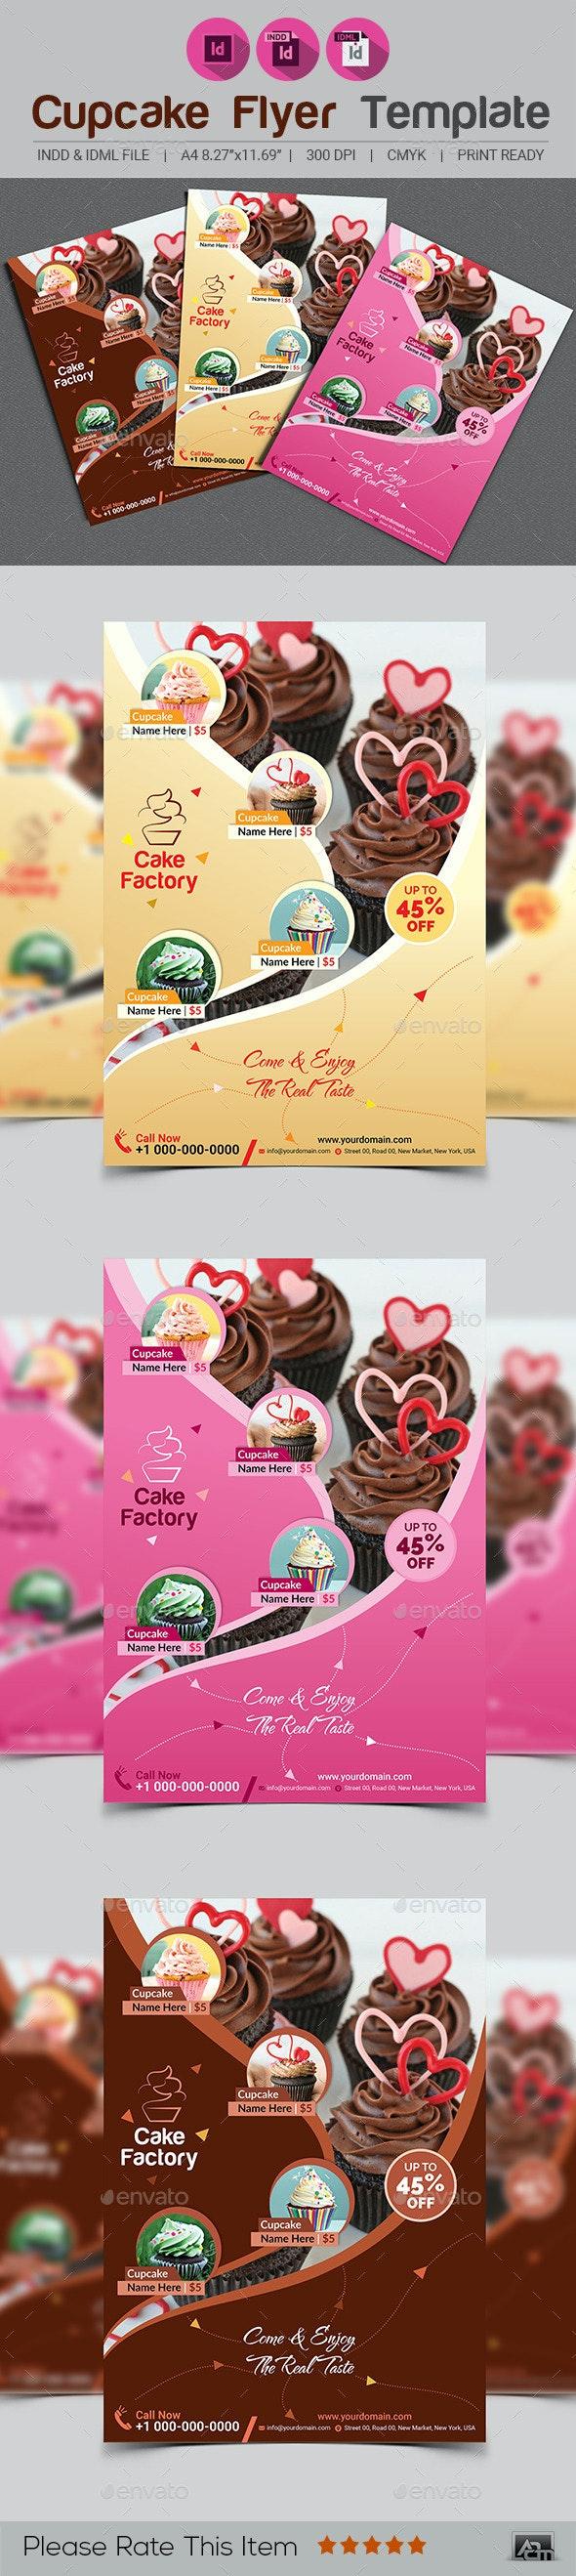 Cupcake Flyer Template V2 - Restaurant Flyers